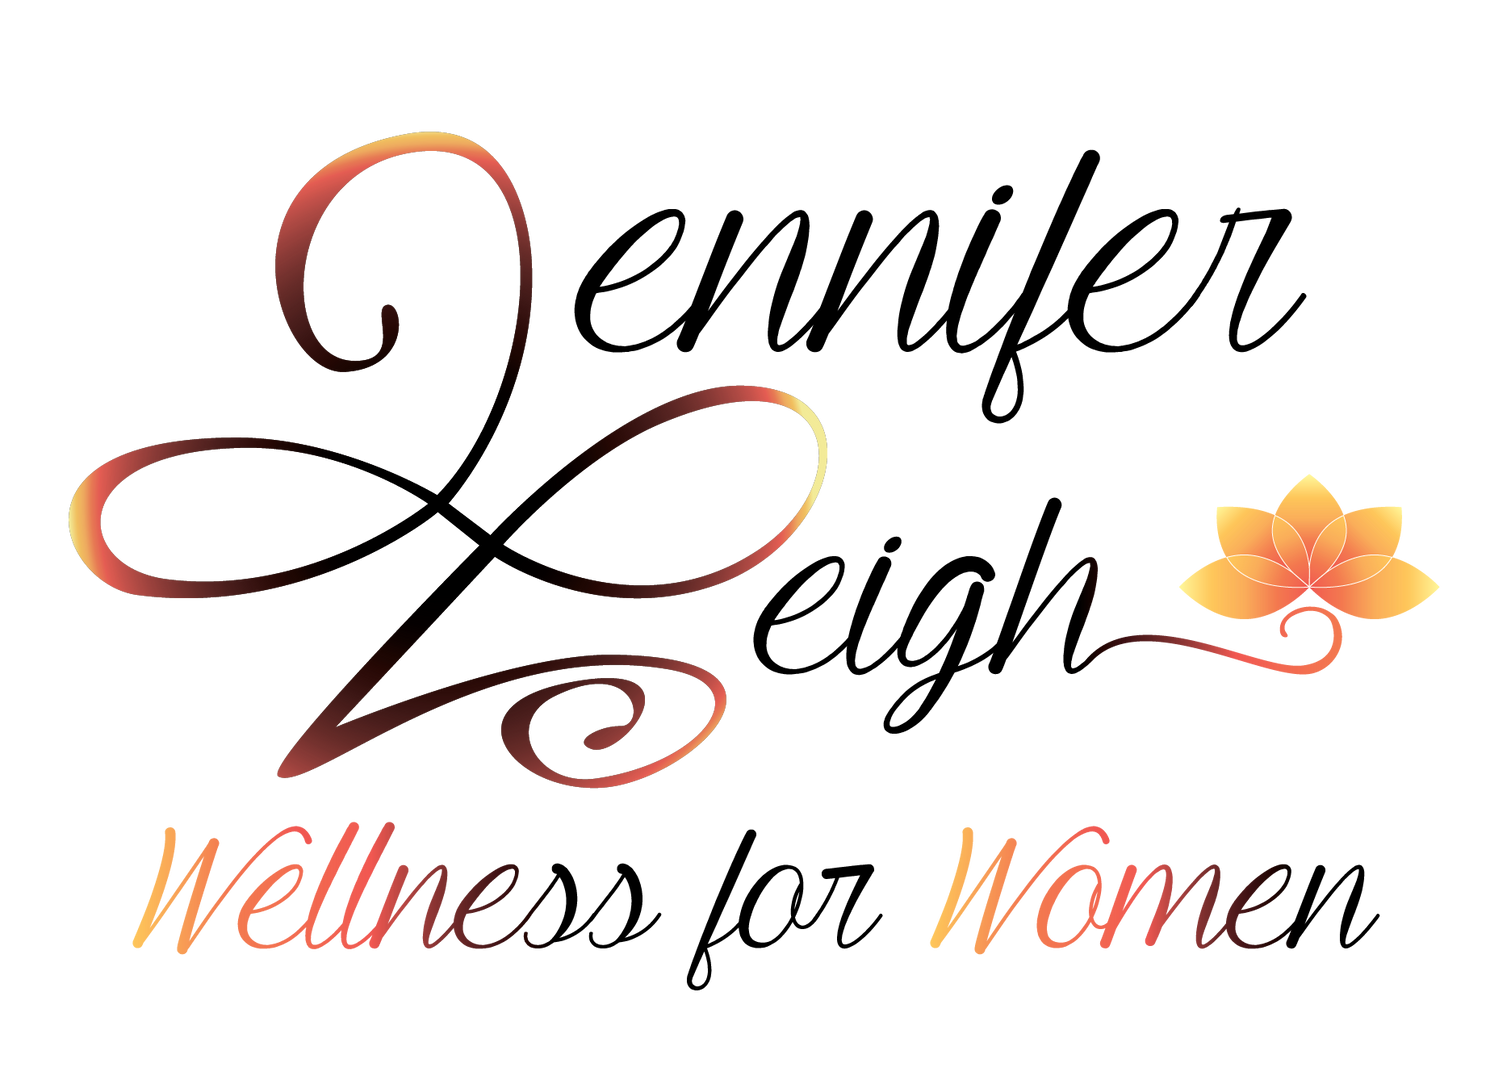 logo_color_png-01.png